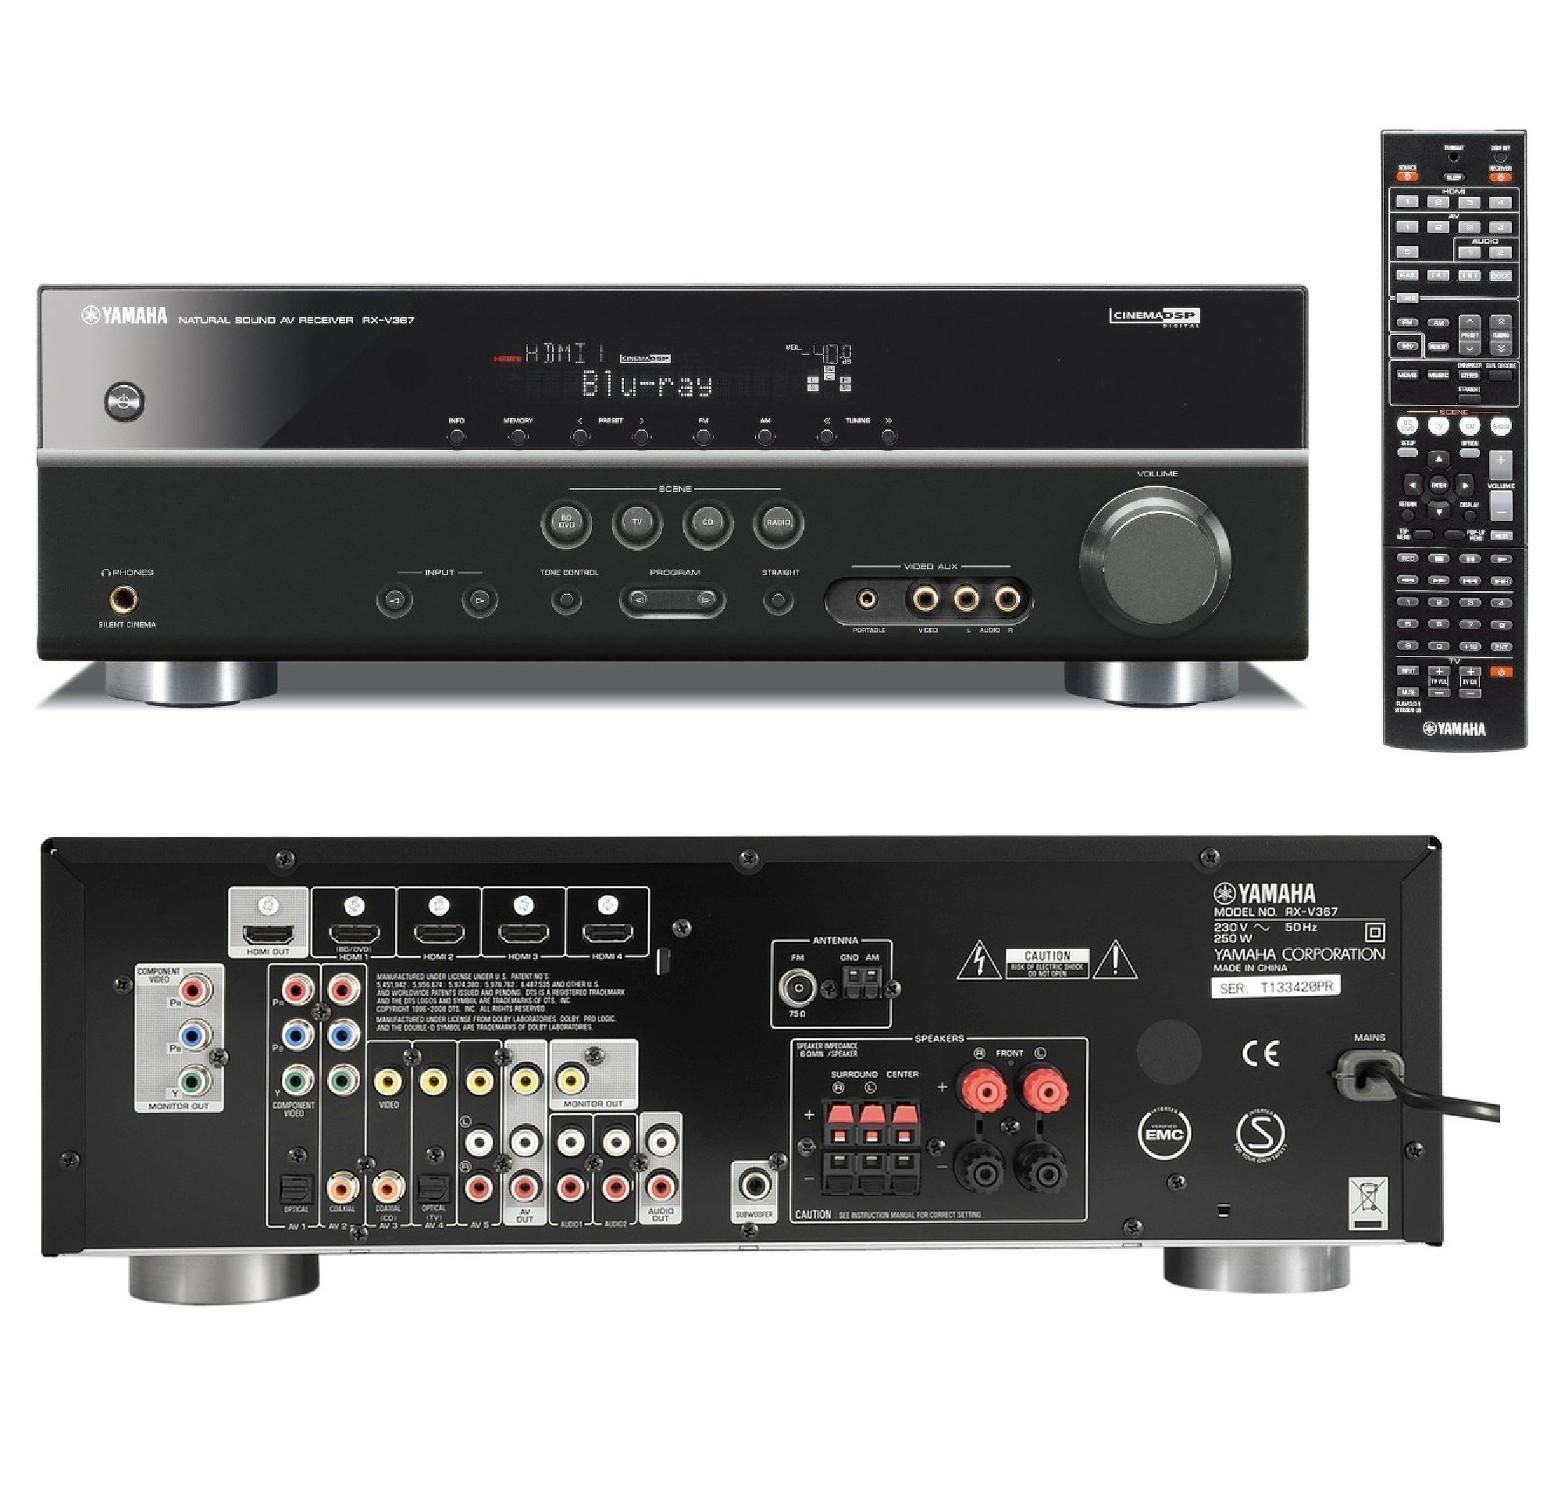 Yamaha rx v367 home cinema 5 1 3d av receiver amplifier 5x for Yamaha amplifier receiver